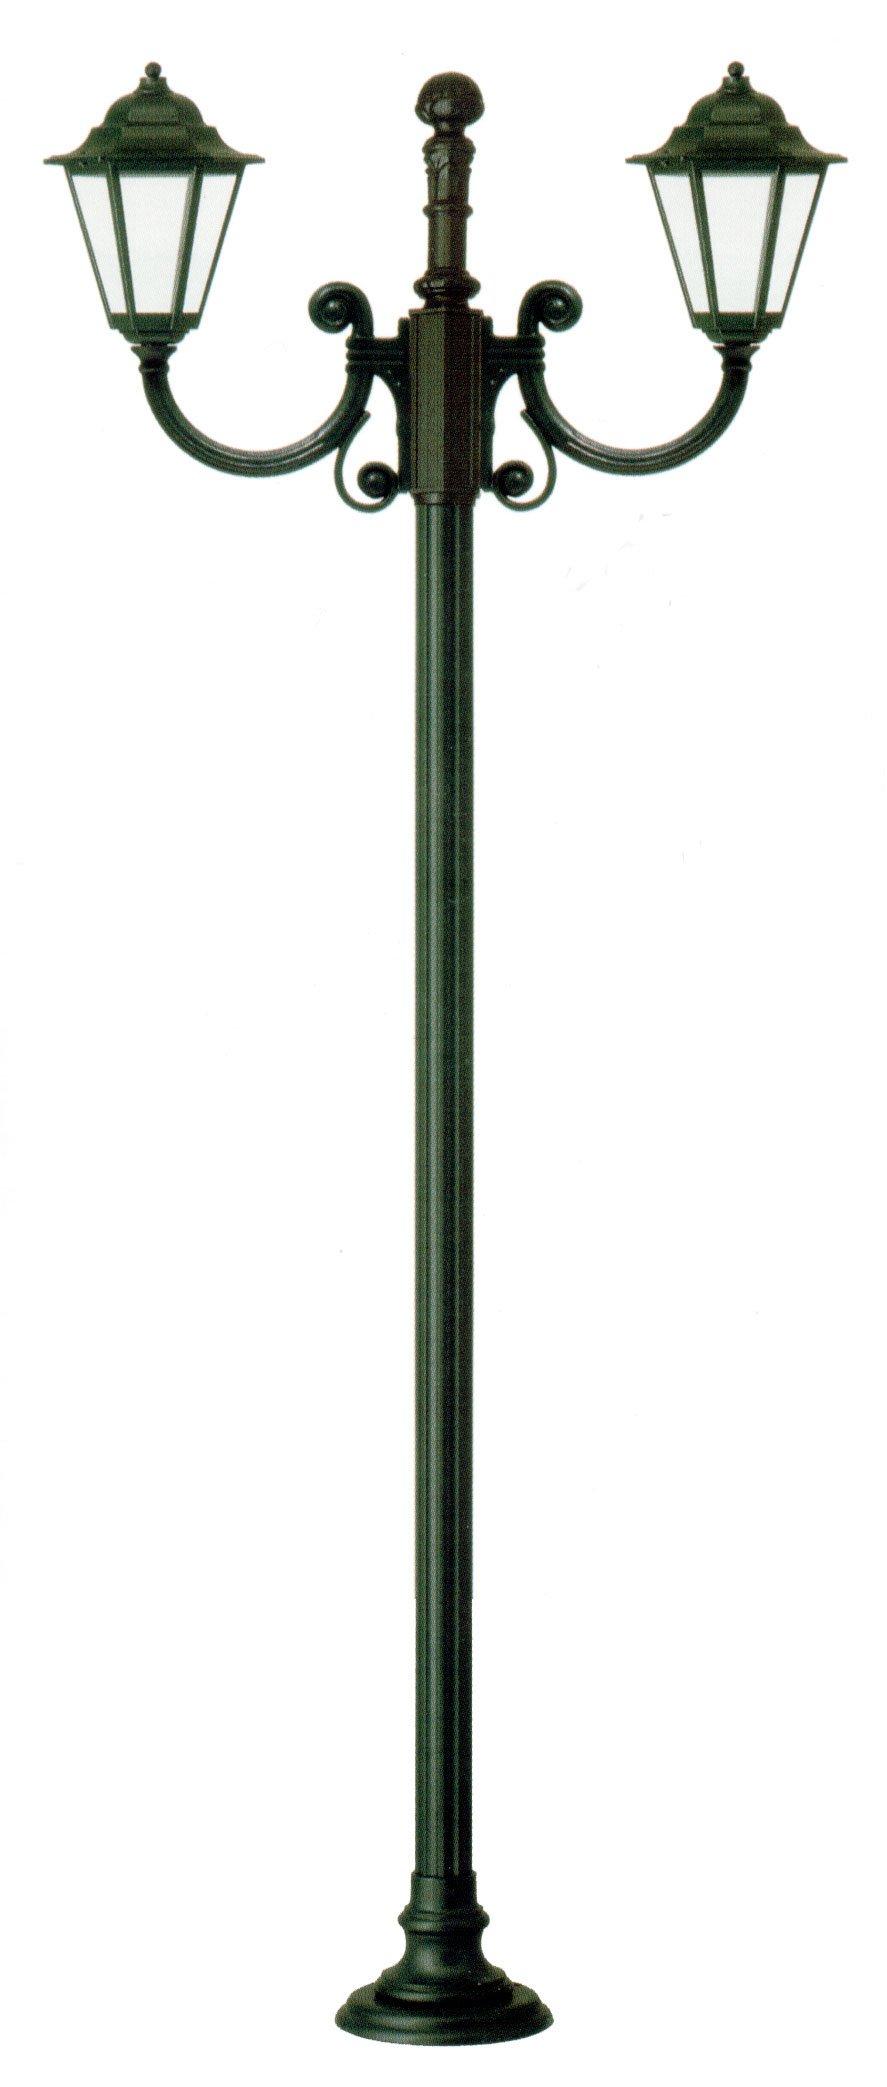 Rea-250-2f Street Lights